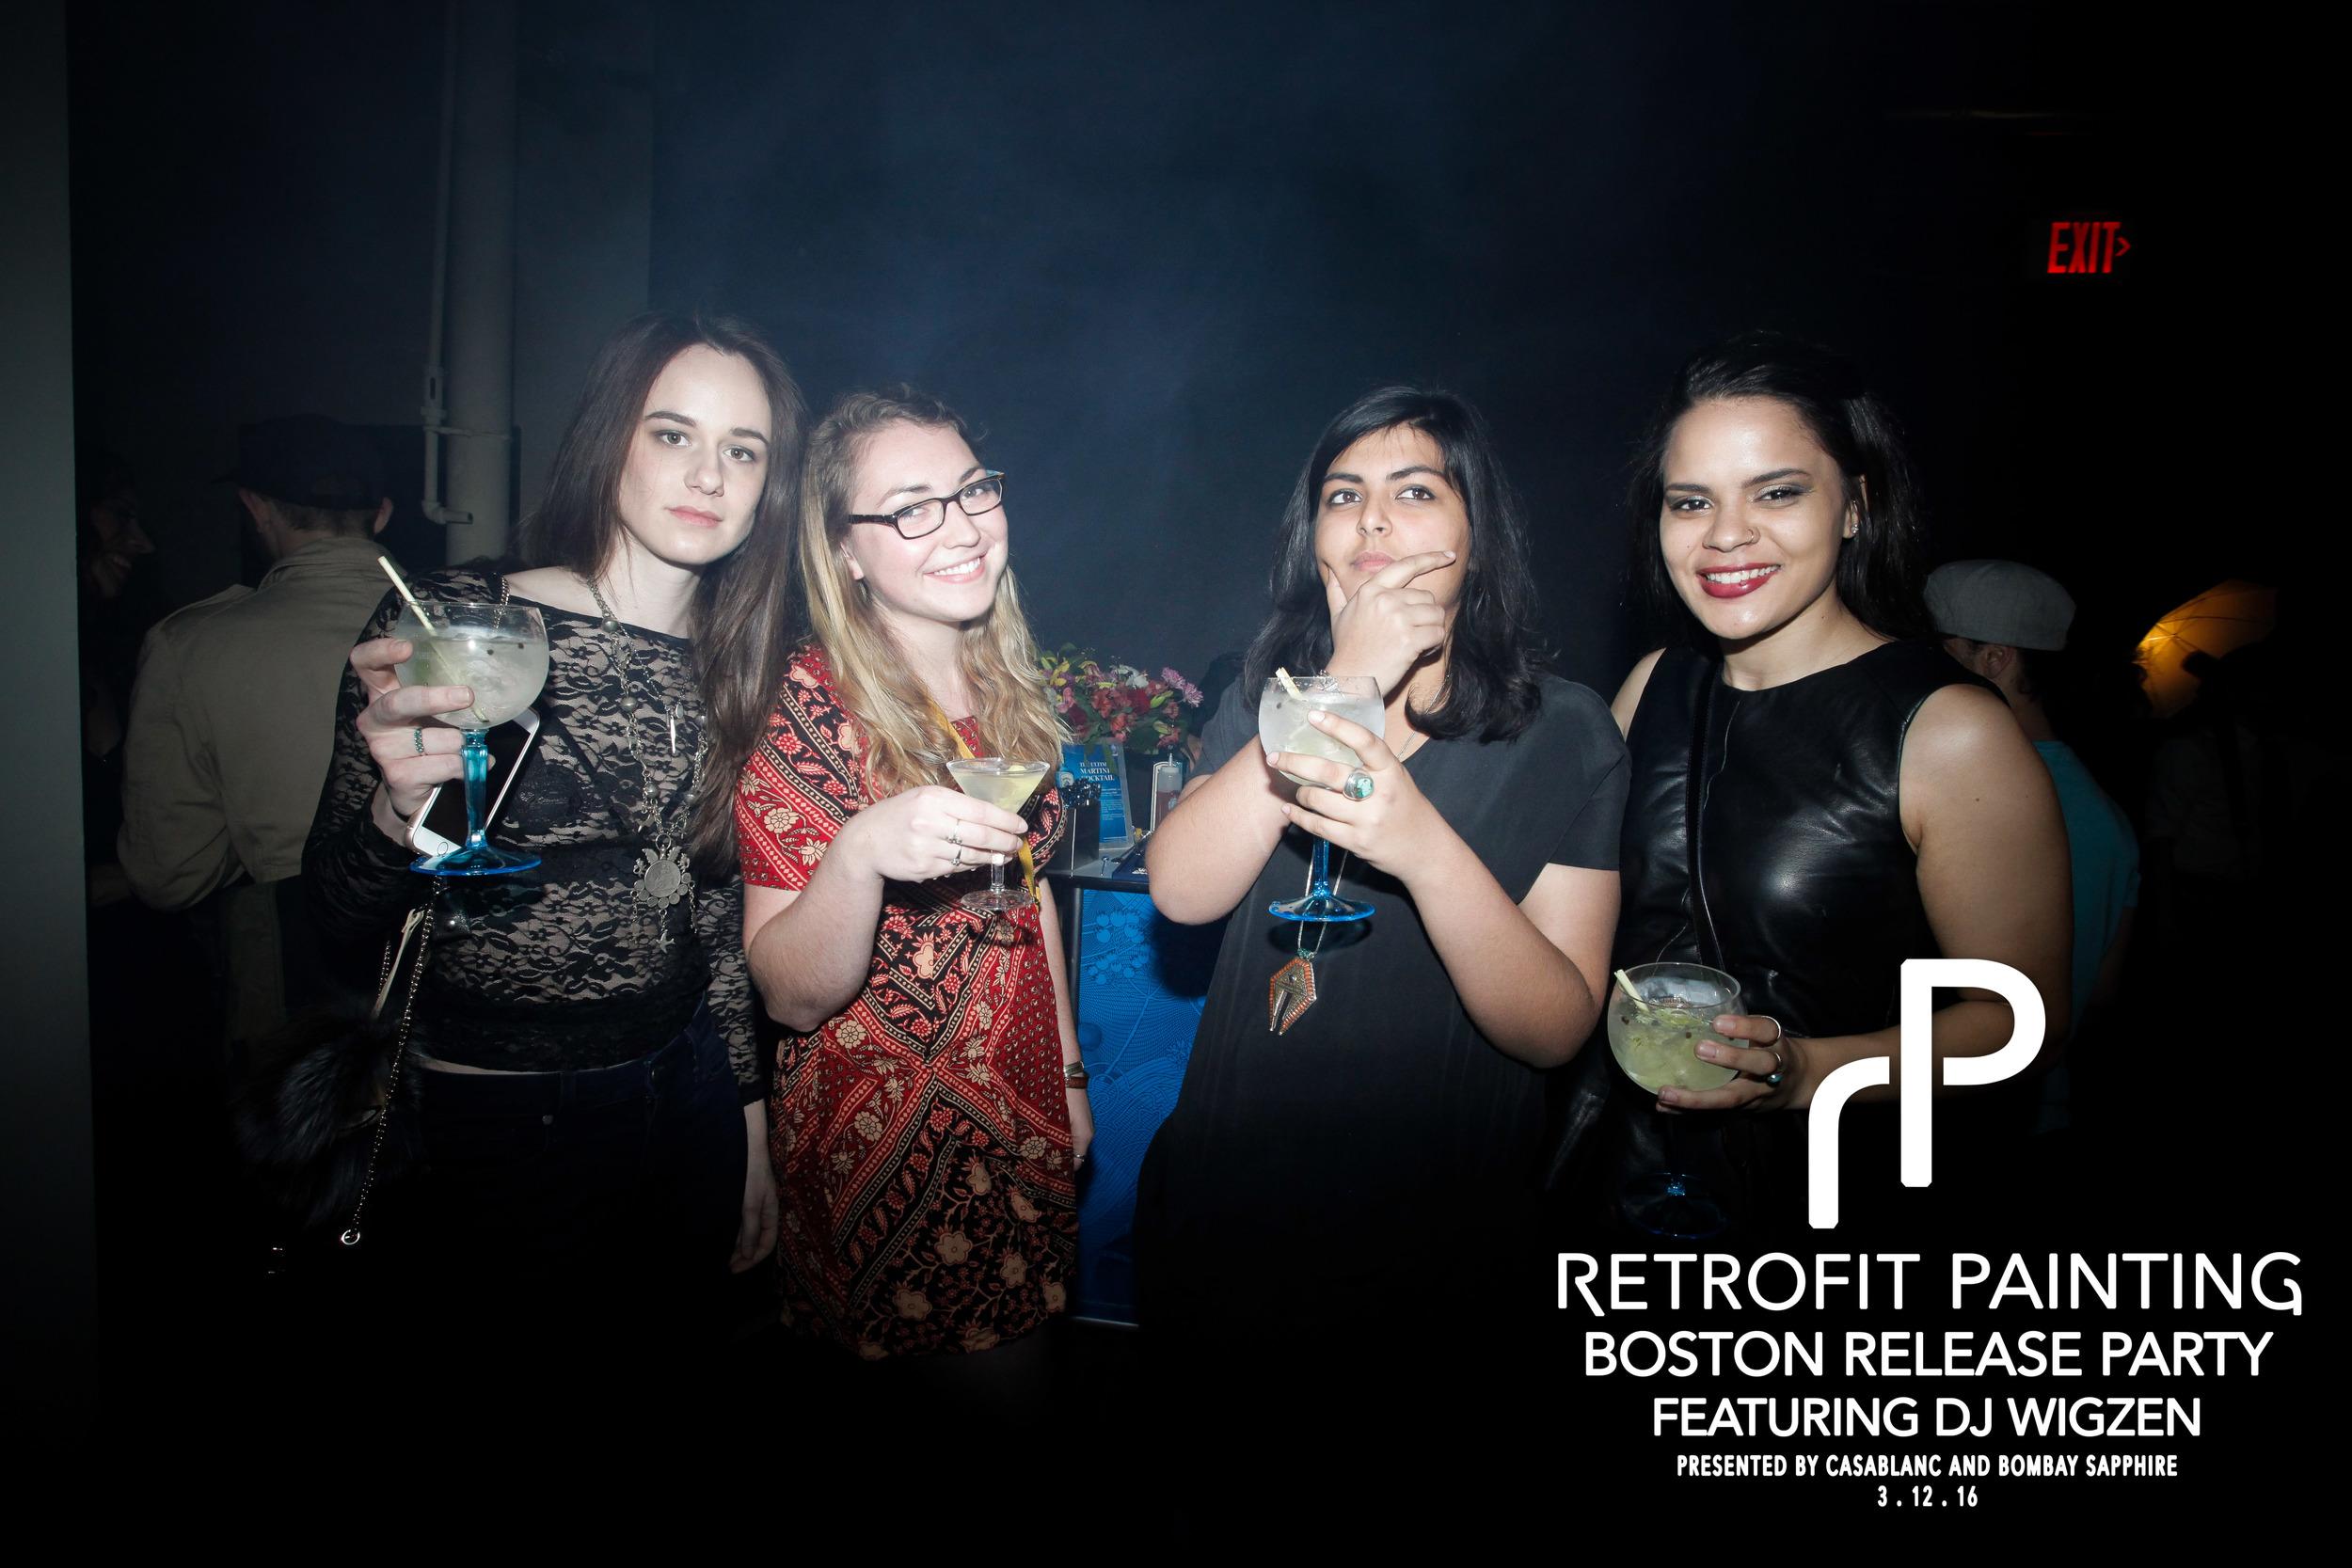 Retrofit Painting Boston Release Party 0101.jpg